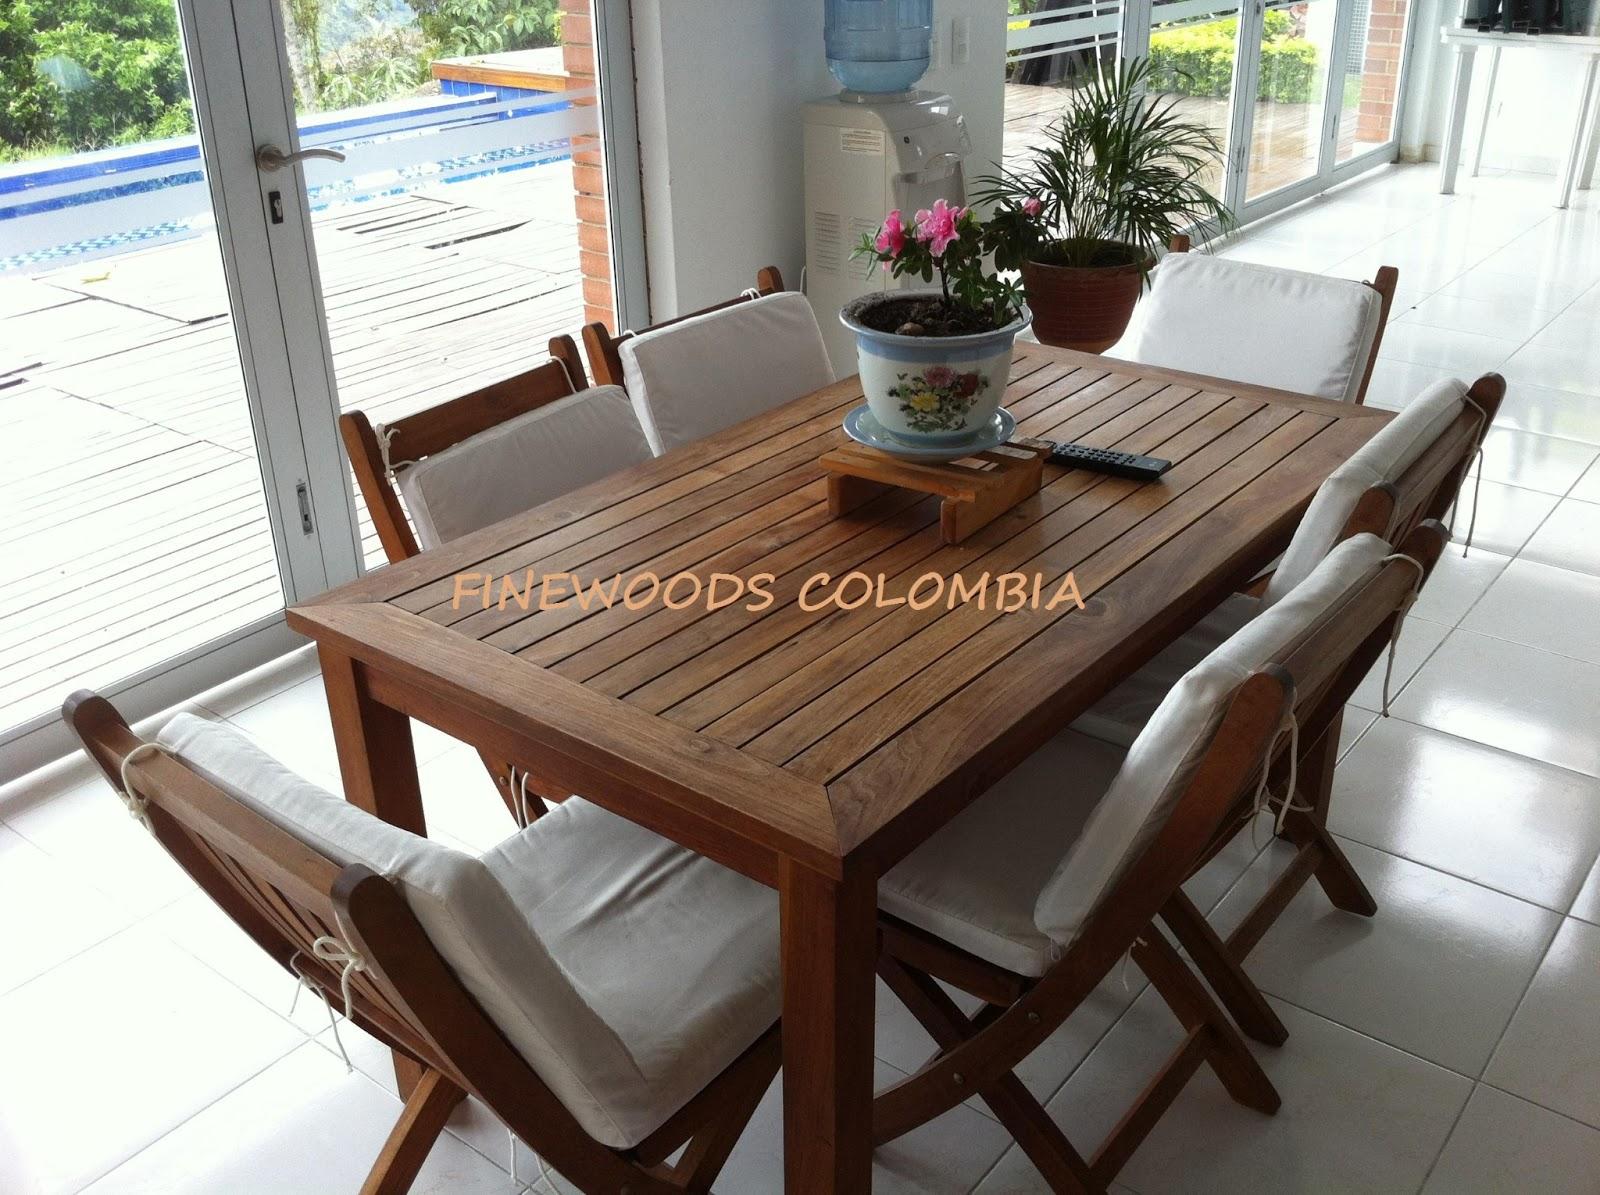 Finewoods colombia muebles exterior - Madera teca exteriores ...